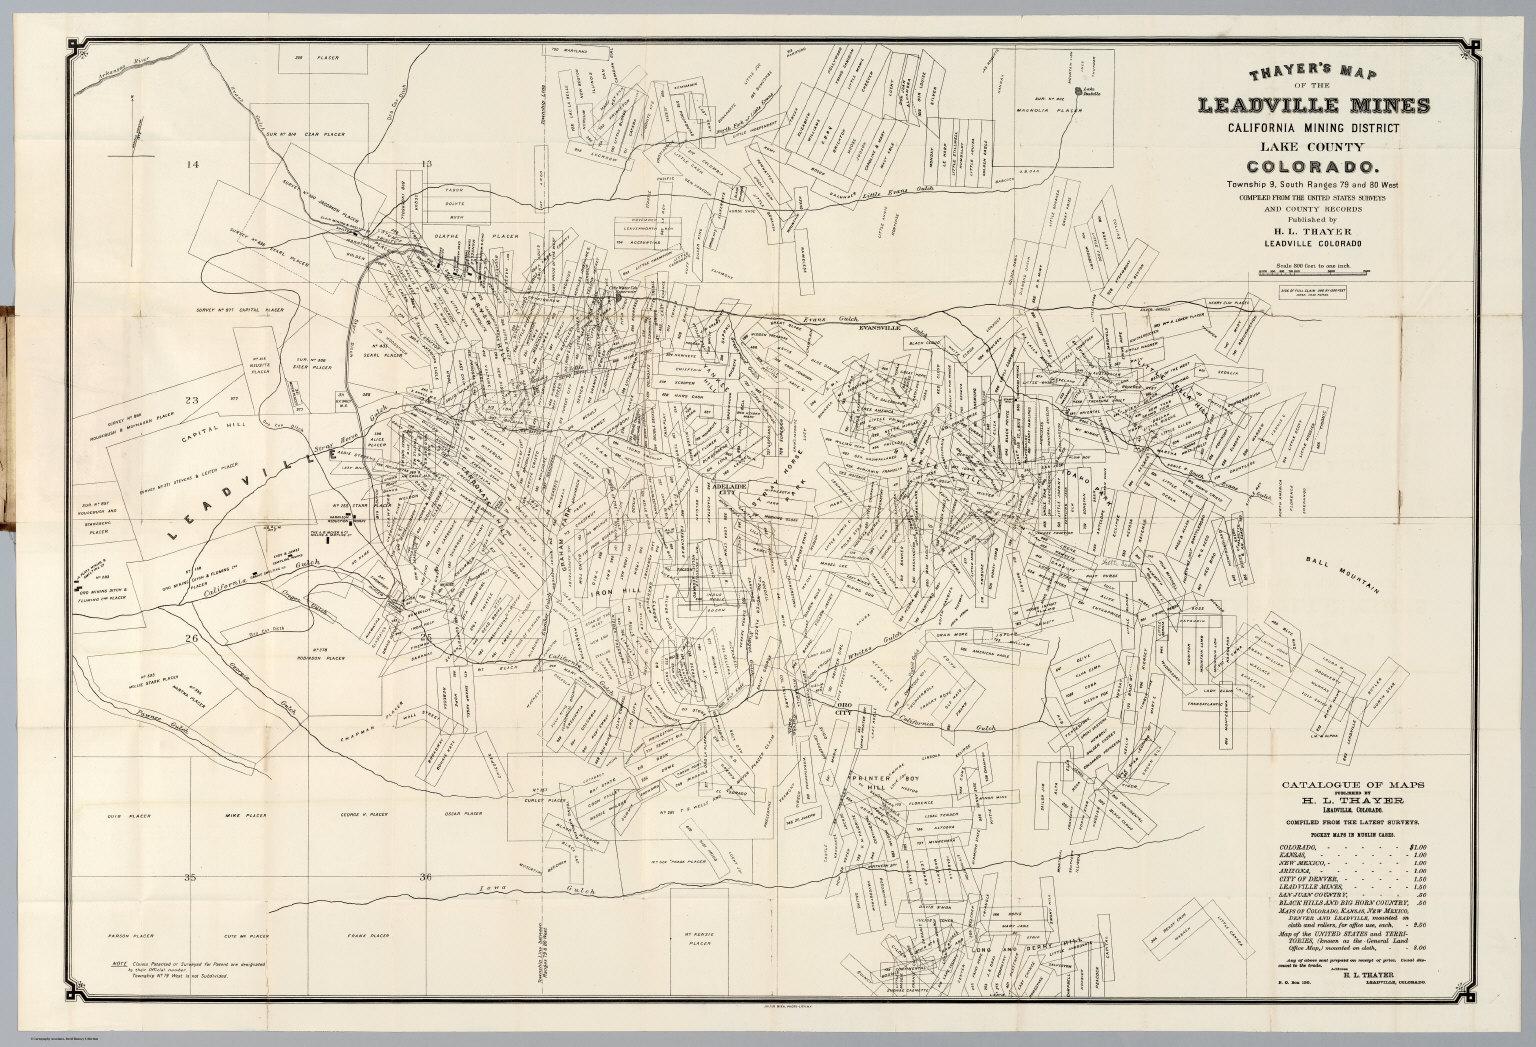 Lake County Colorado Map.Leadville Mines California Mining District Lake County Colorado